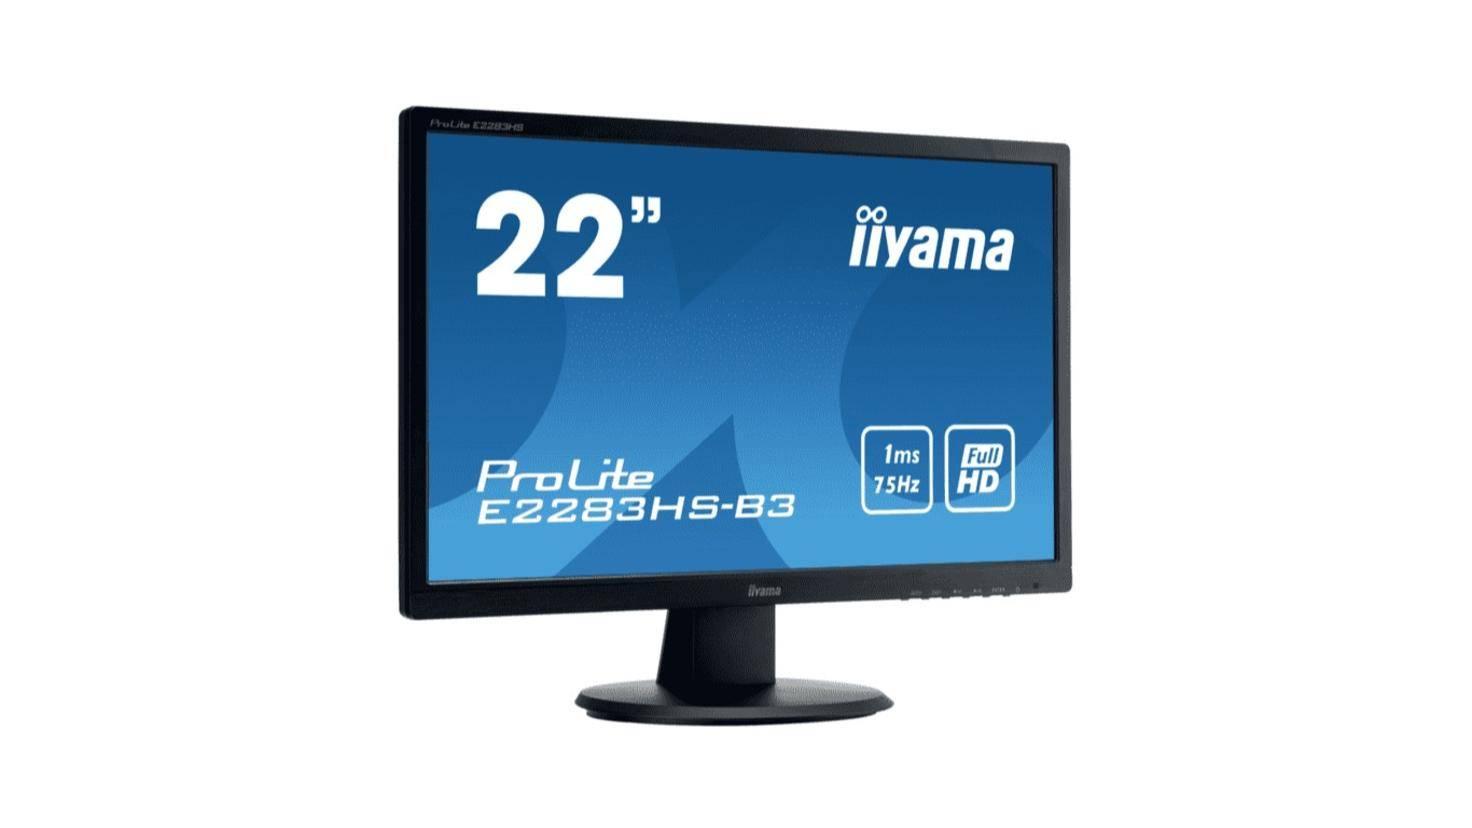 IIYAMA-PROLITE-E2283HS-B3-monitor